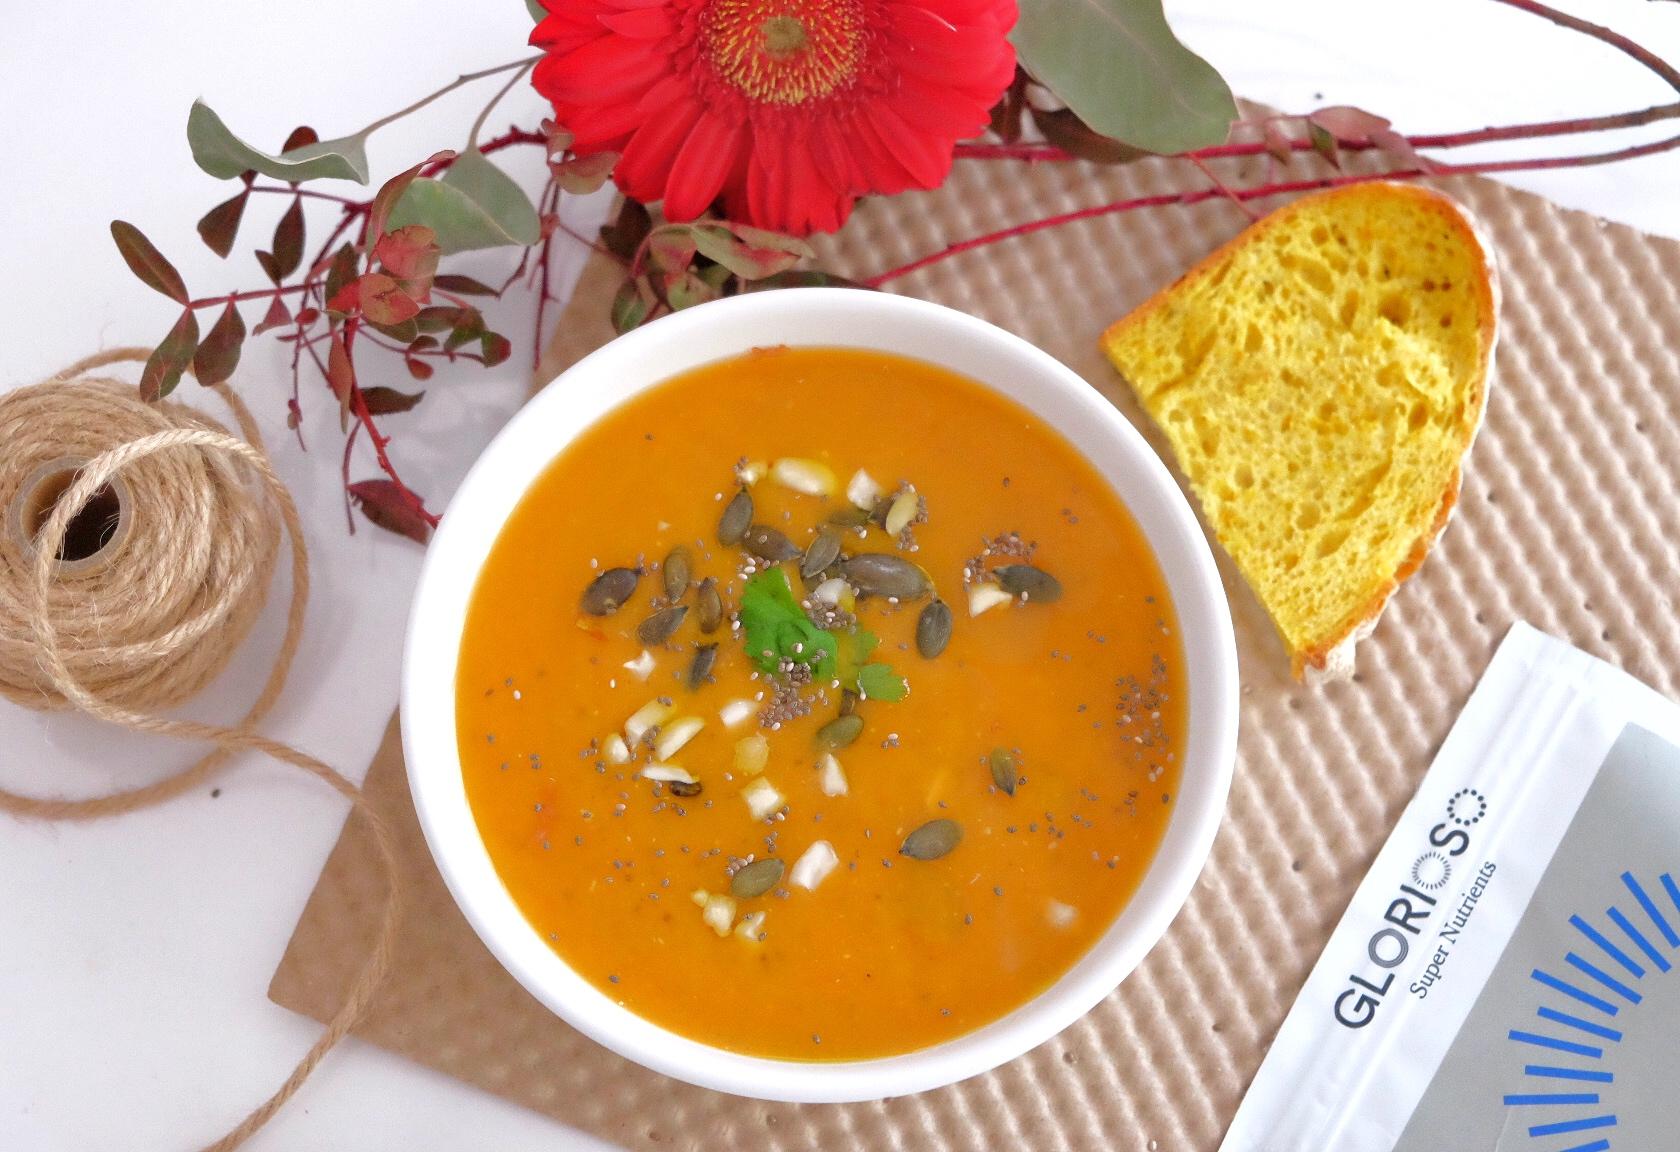 Sweet potato soup with chia seeds